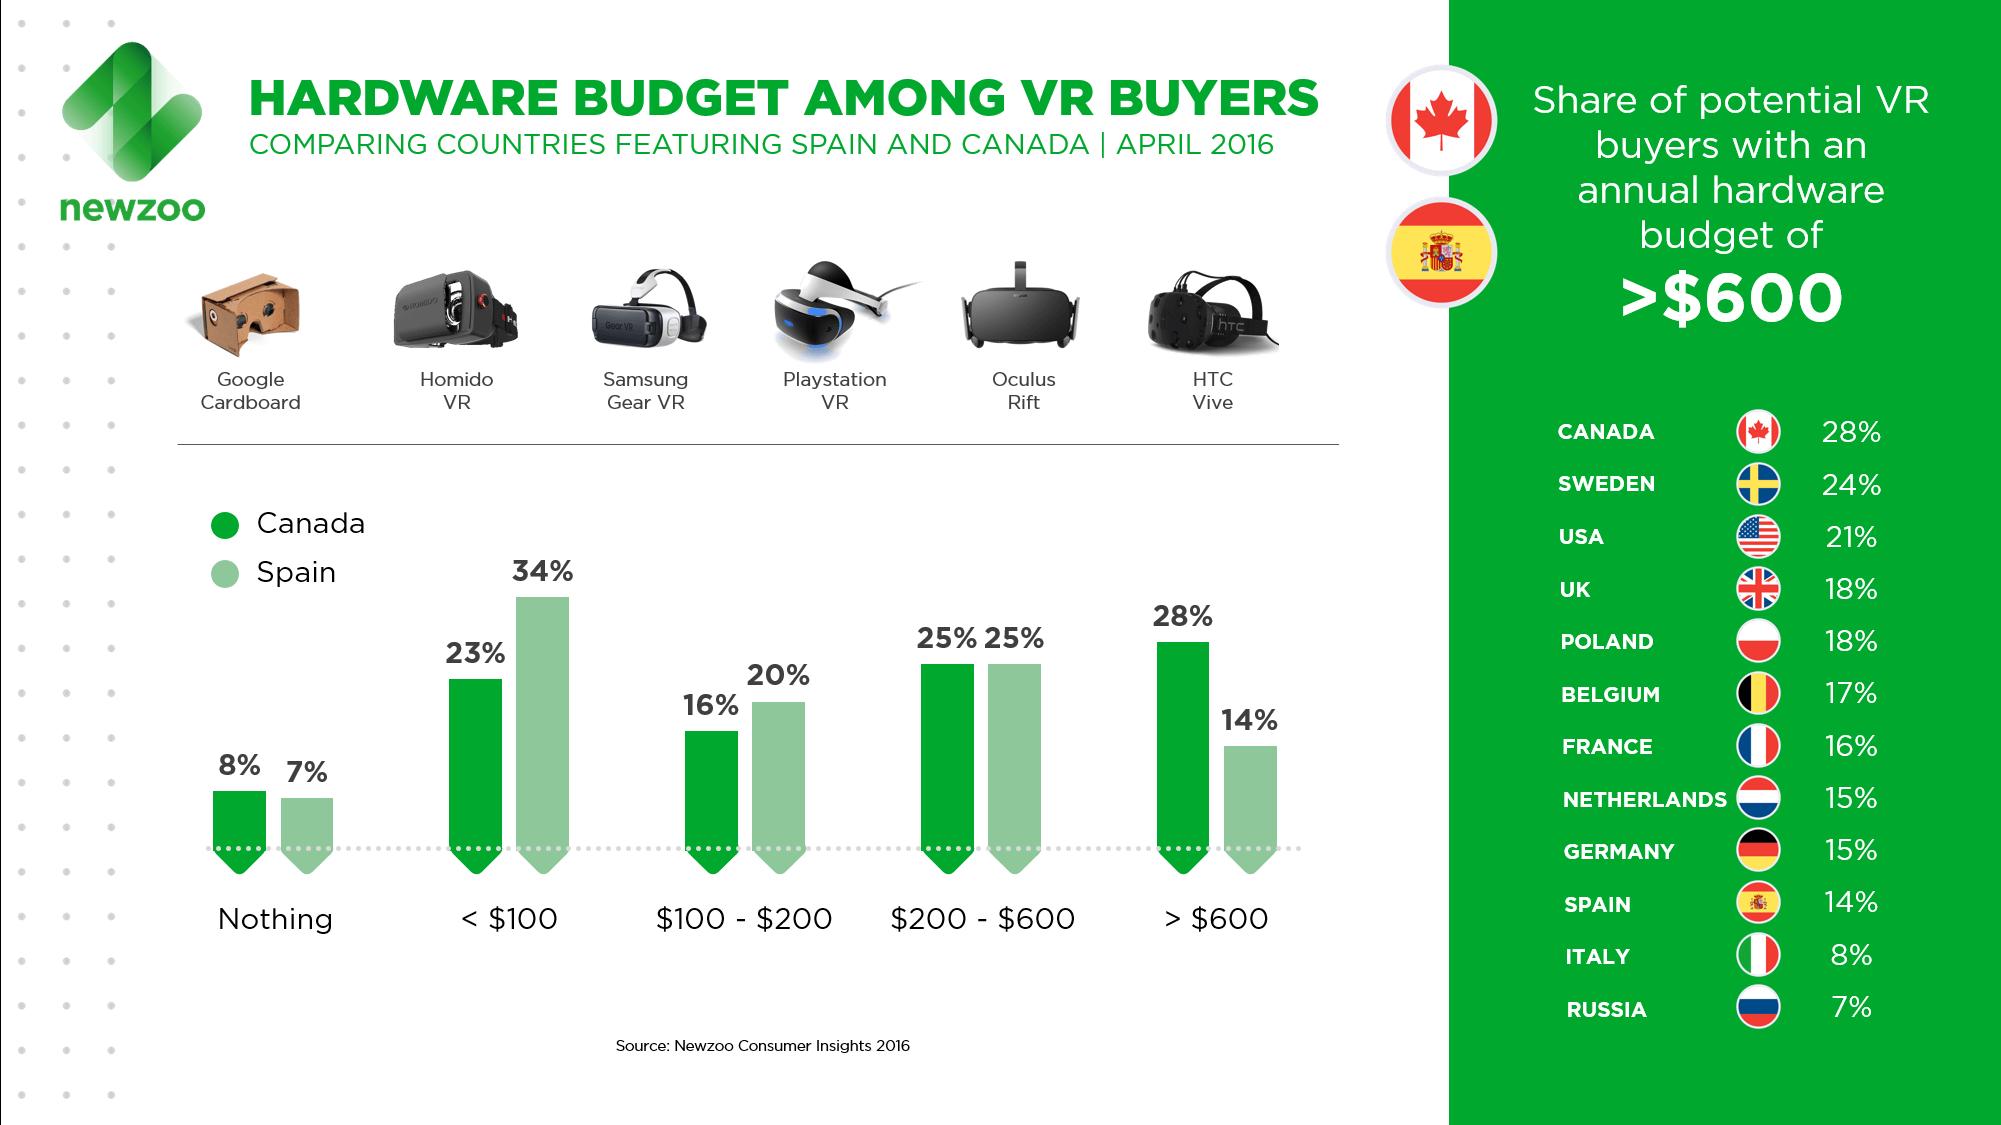 Newzoo_VR_Buyers_Hardware_Budget